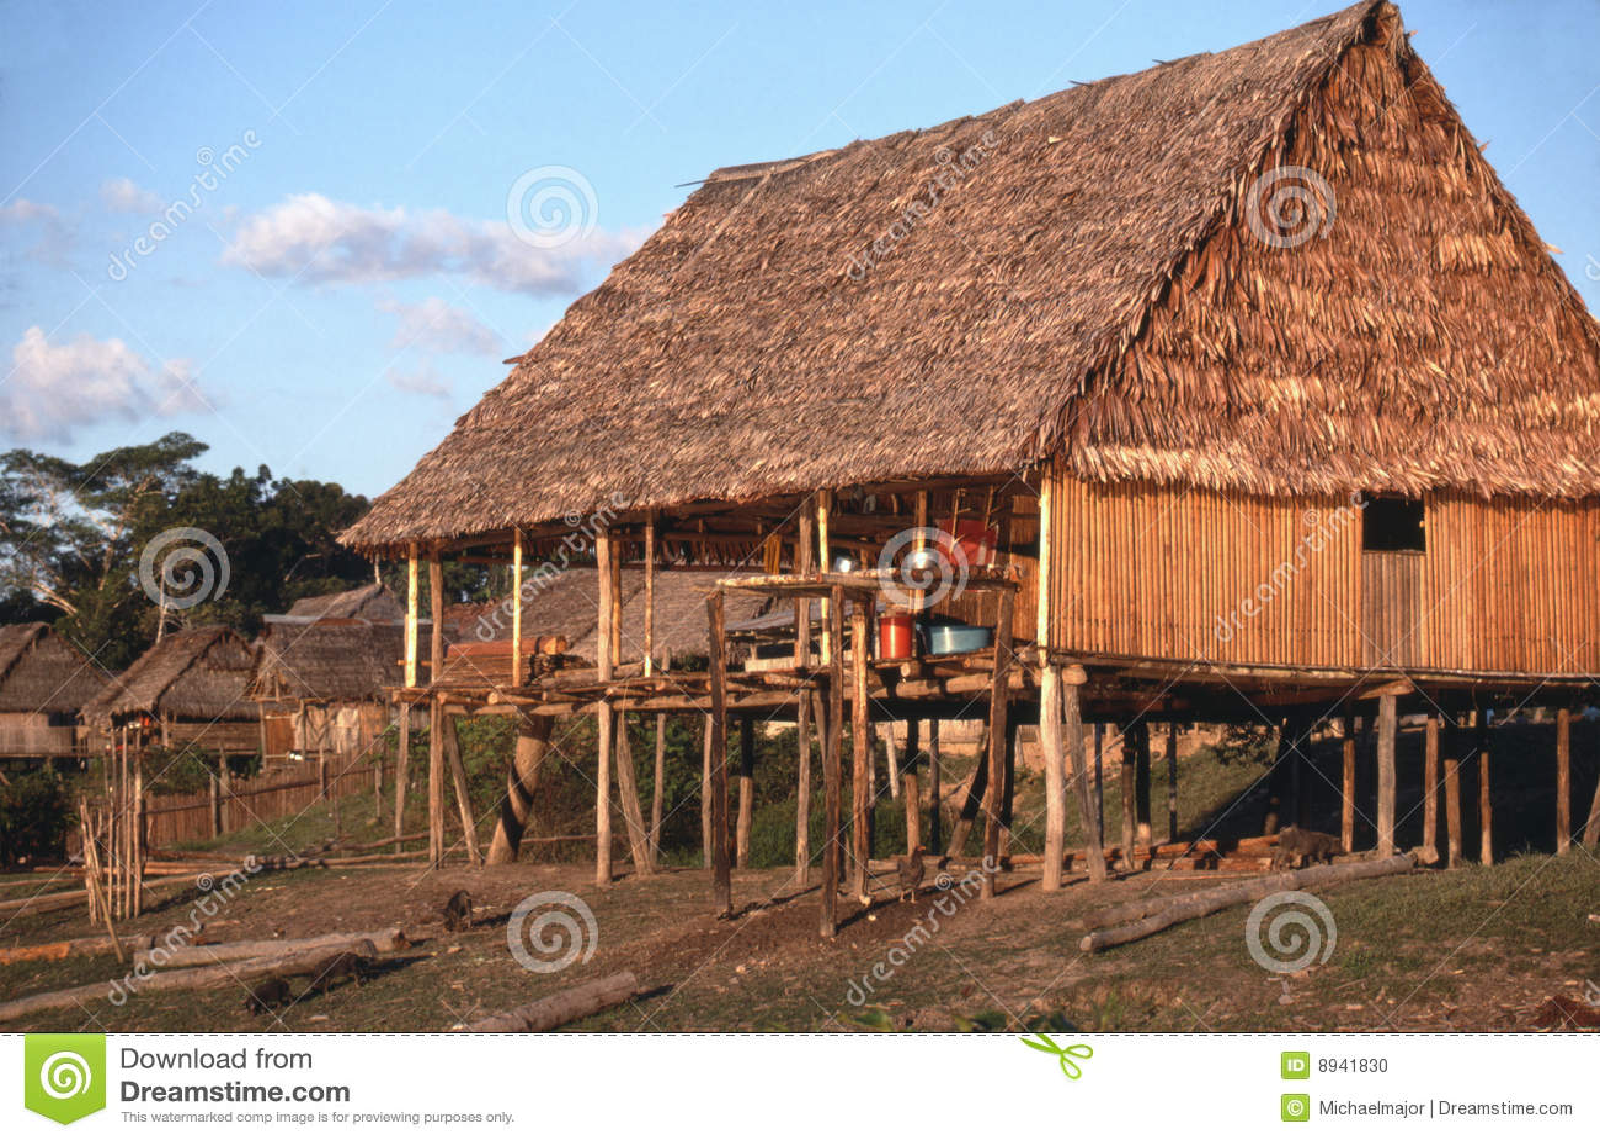 Thatched hut on peruvian amazon stock photo image 8941830 for Amazon casa